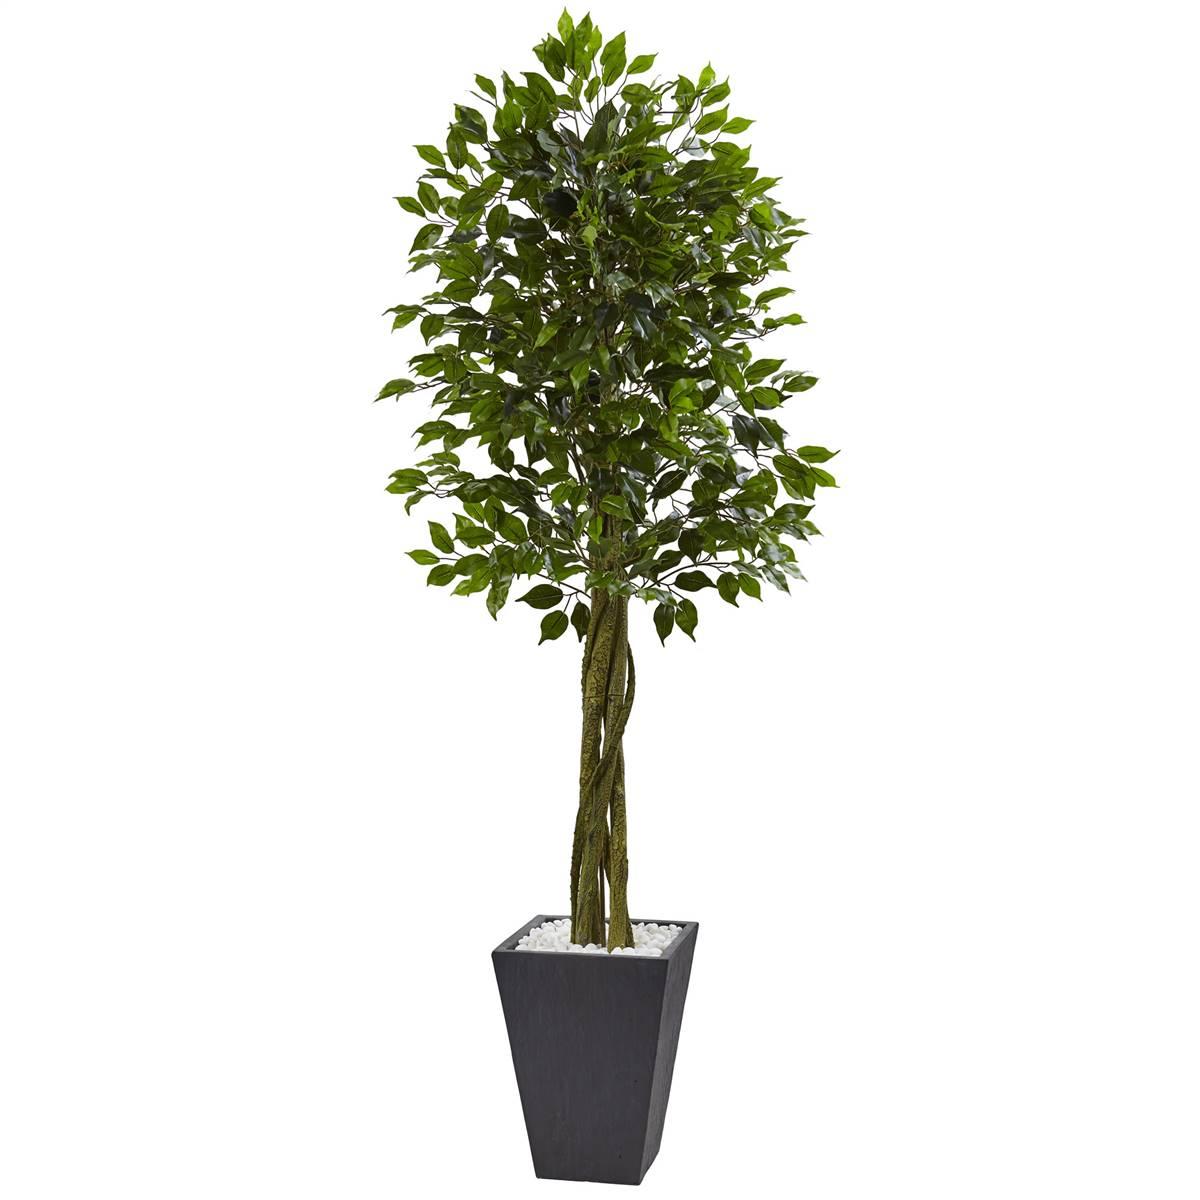 Climb The Walls With Ficus Pumila Steemit